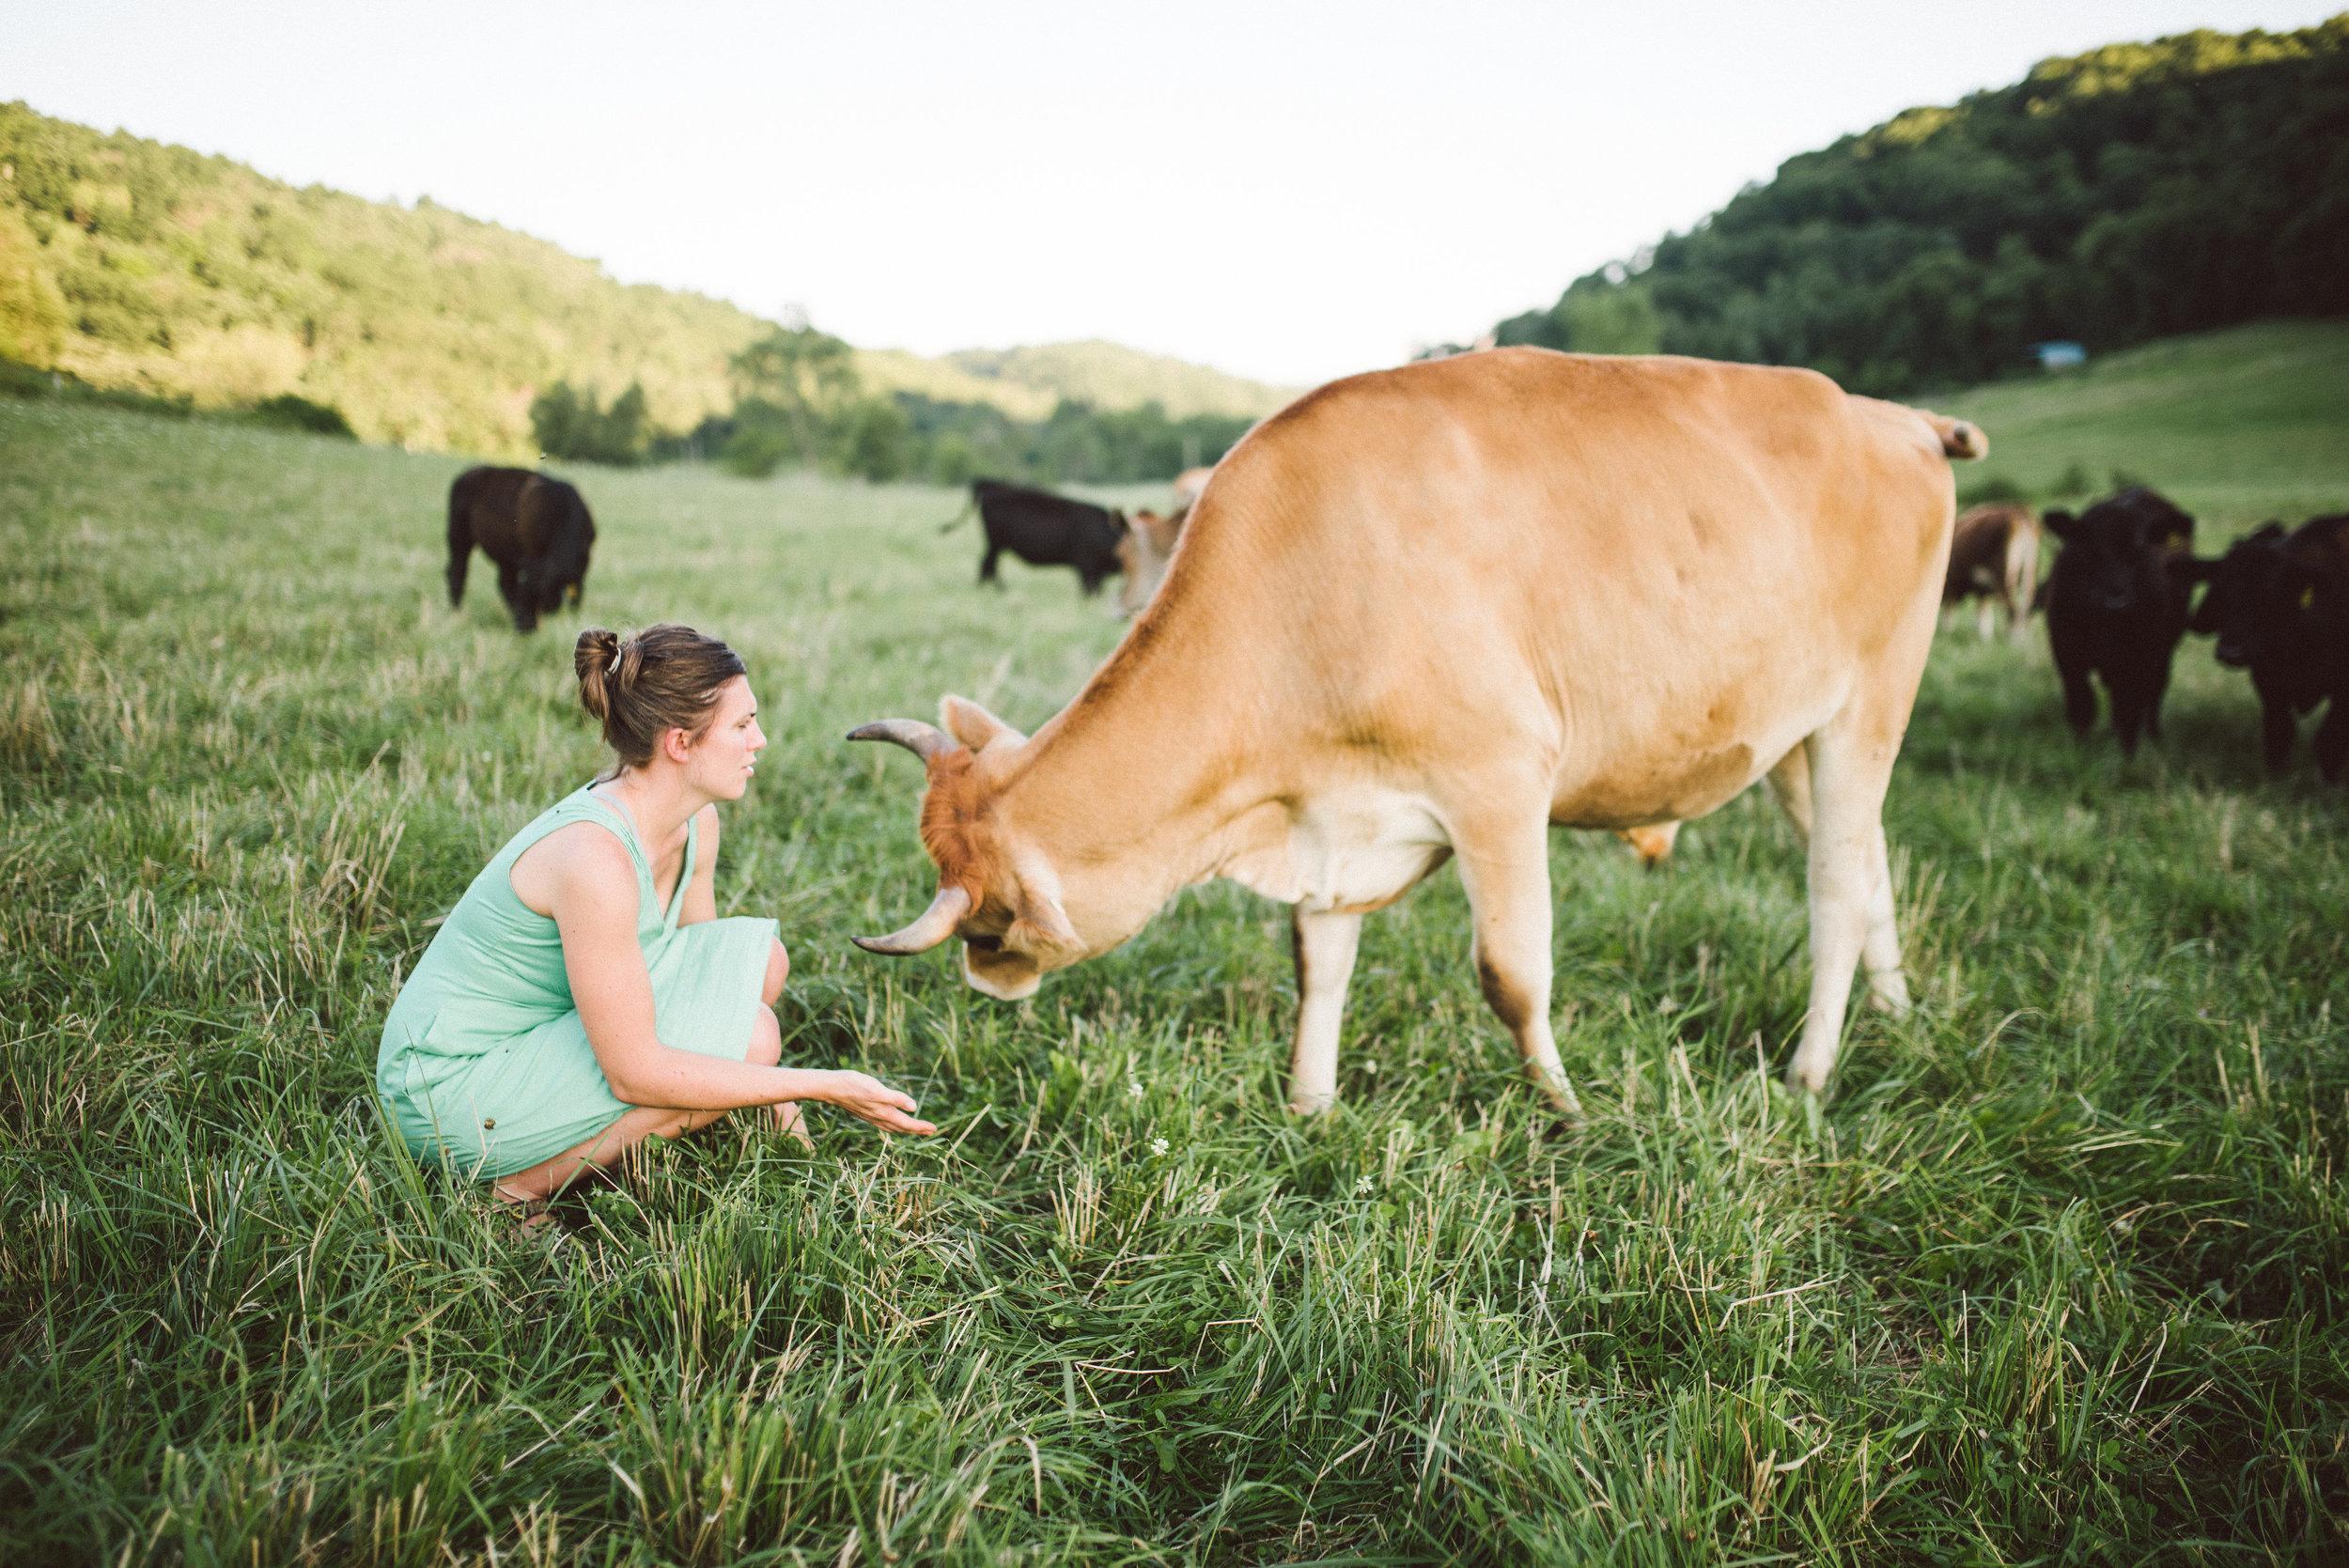 Cate_Family_Farm_Wisconsin-17.jpg